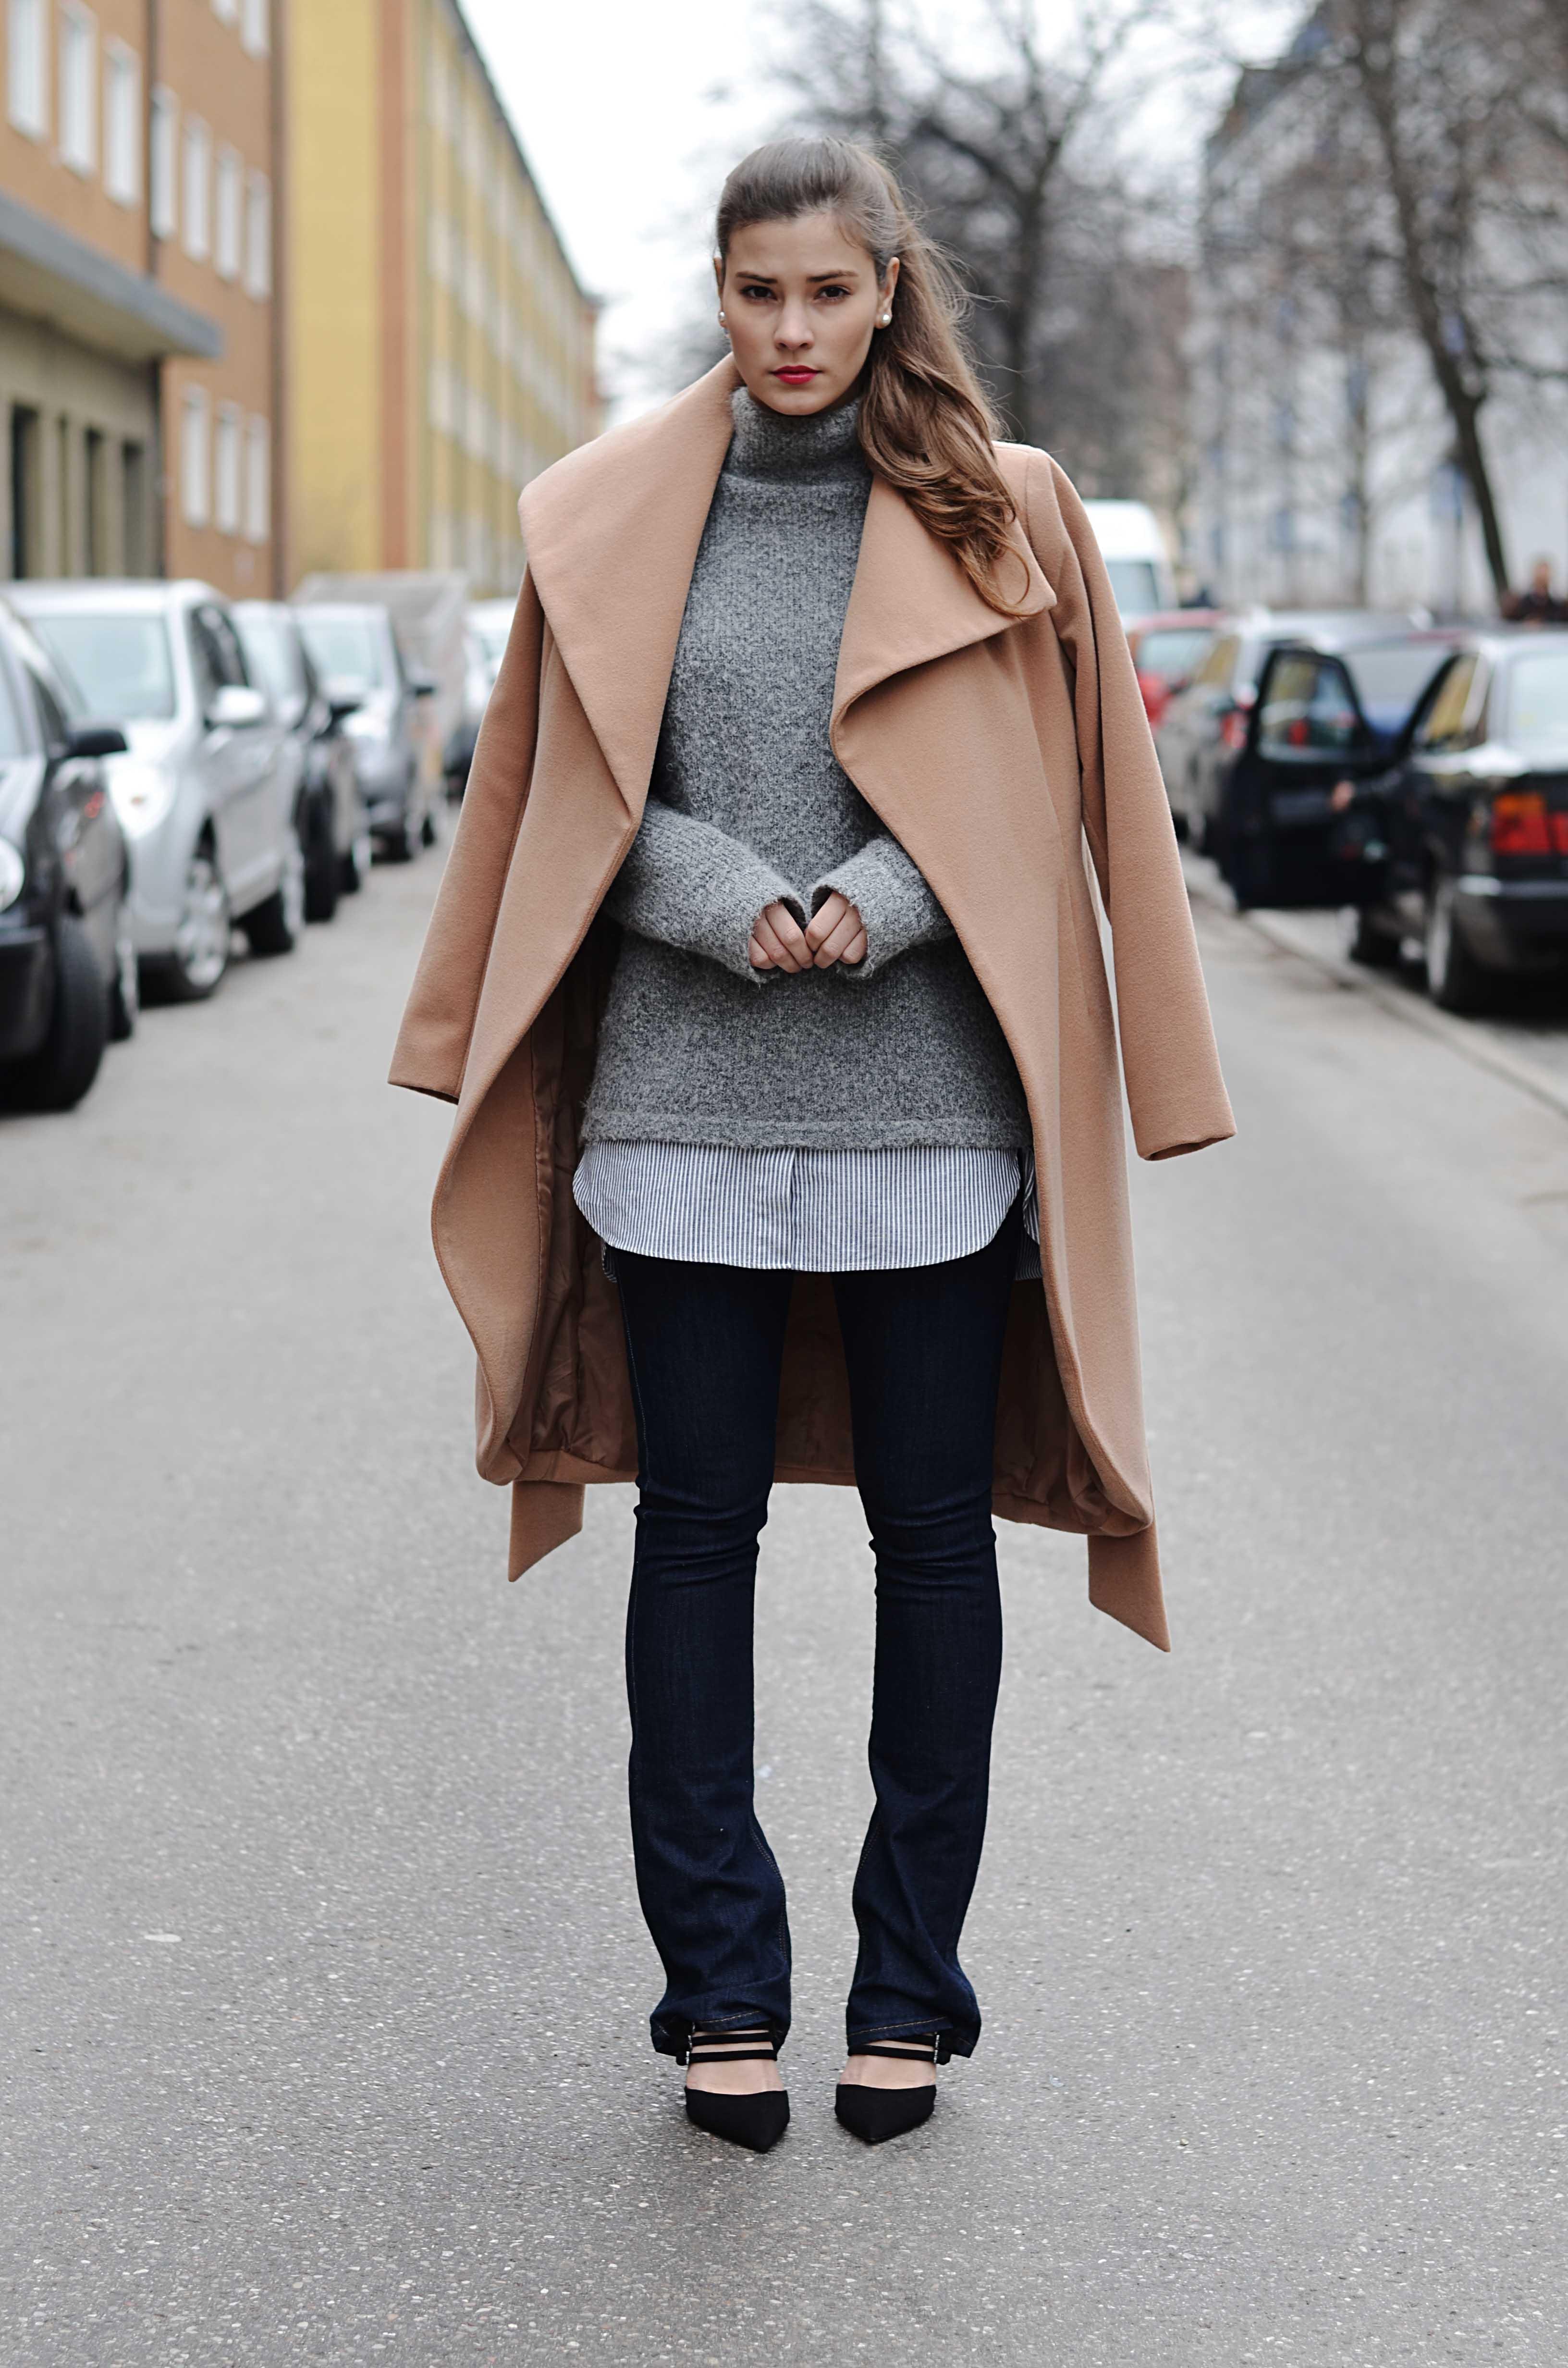 Fashionbloggermünchen-fashionblogger-blogger-fashionblog-münchen-munich-fashion-outfit-mode-style-streetstyle-bloggerstreetstyle-fashiioncarpet-fashiioncarpet-look-ootd-fashionblogdeutschland-deutscherfashionblogger-fashionbloggergermany-germanblogger-fashionbloggerdeutschland-deutschland-fashionblogger-camelcoat-otto-buffalomantel-buffalo-flaredpants-flared-schlaghose-streetstyleschlaghose-schlafghoseblogger-mantel-pumps-zarasale-sale-zara-deutschlandfashionblogger